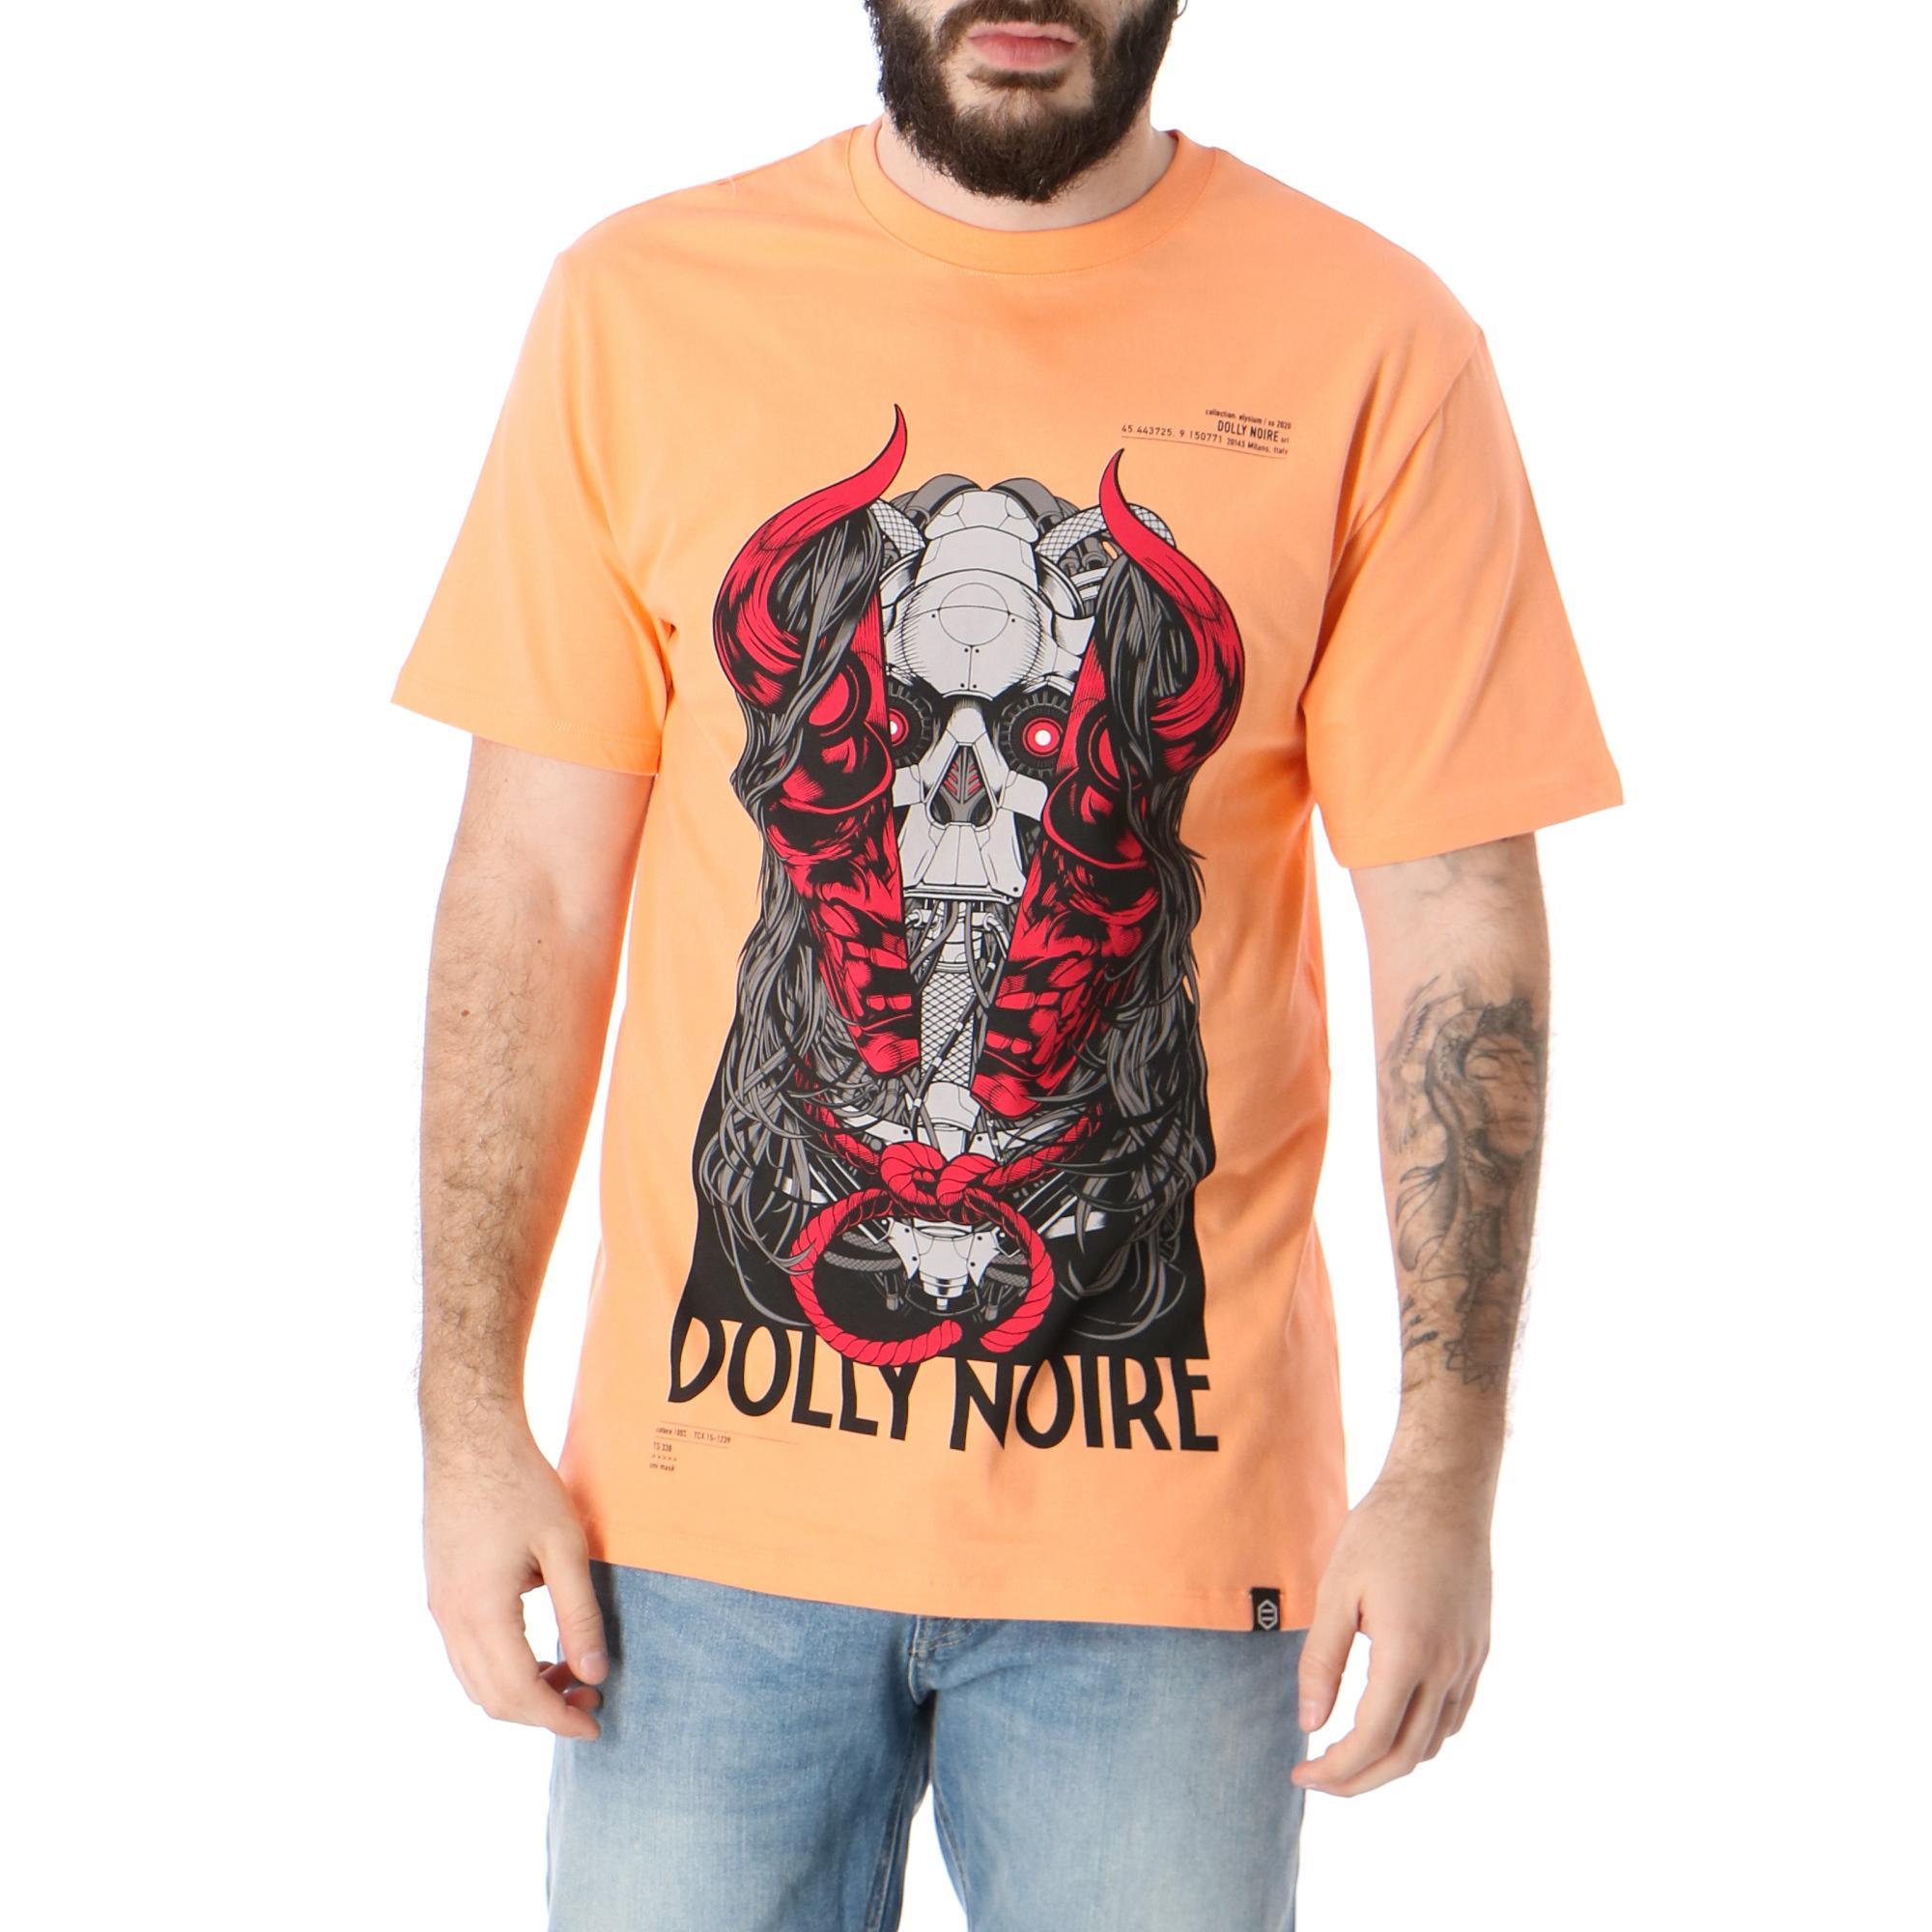 T-Shirt Dolly Noire Oni Mask Vintage